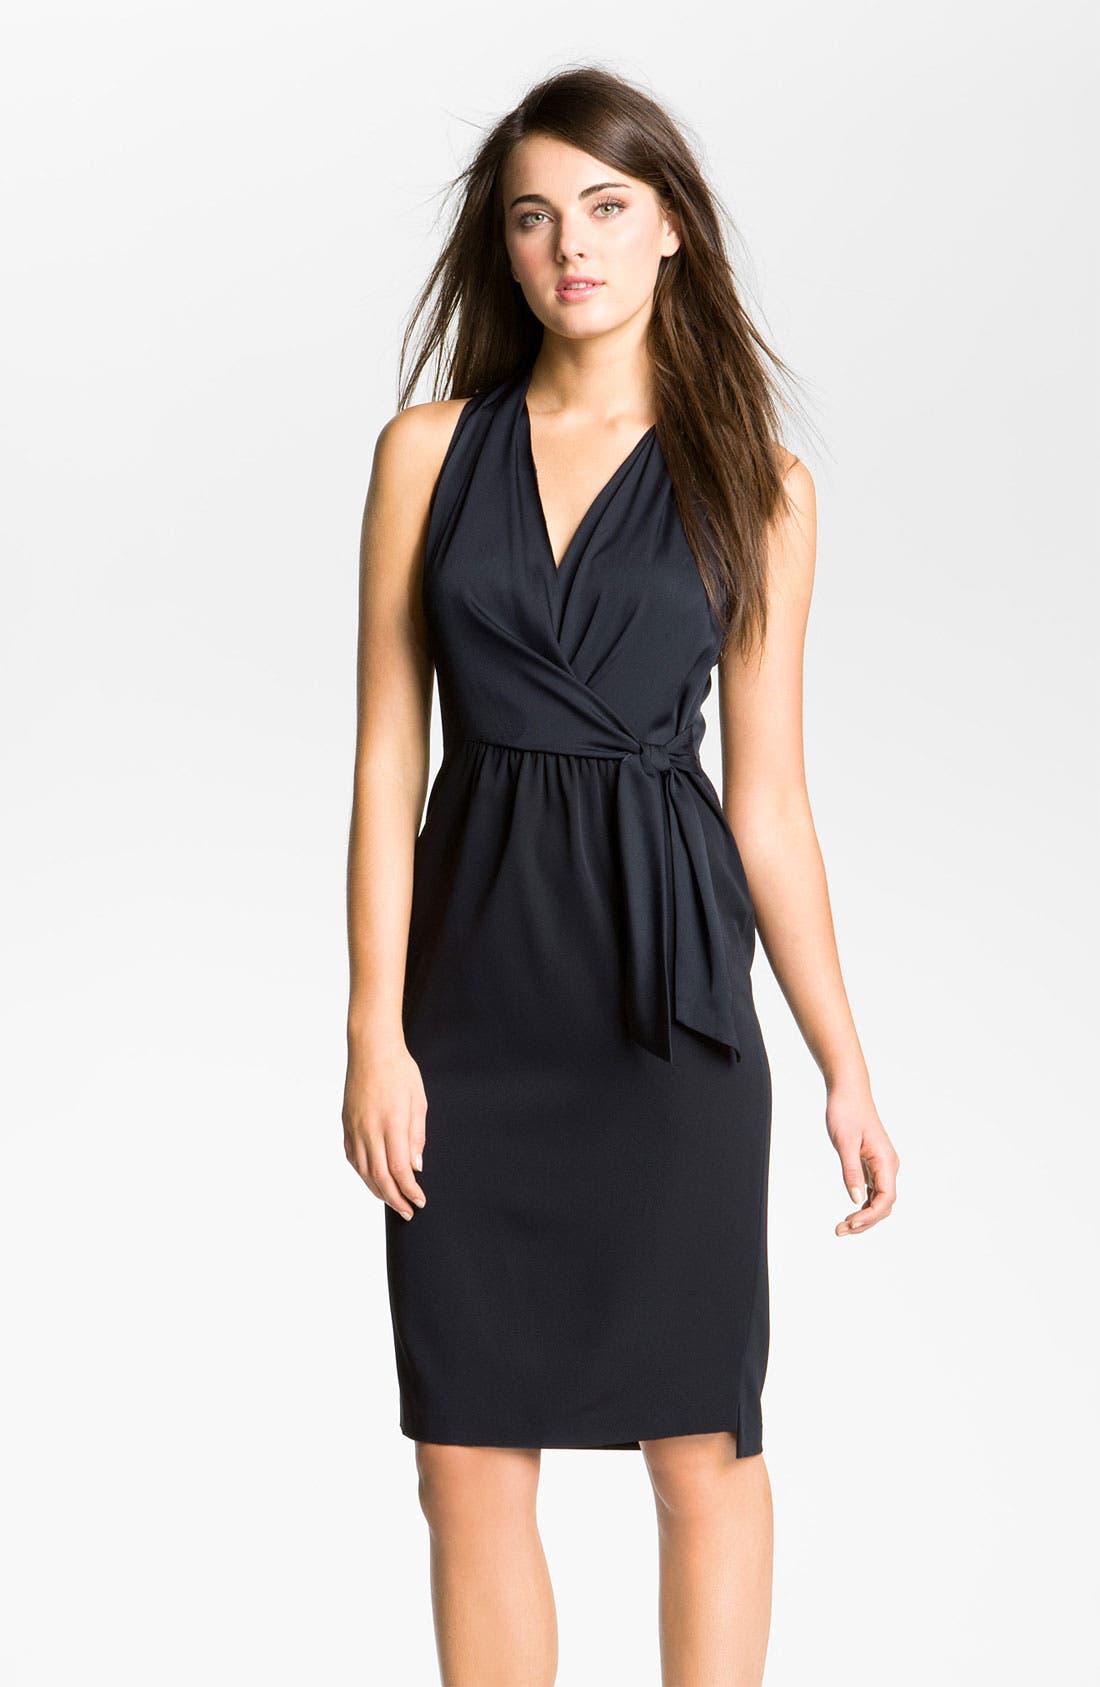 Alternate Image 1 Selected - Elie Tahari 'Savannah' Sleeveless Crêpe de Chine Faux Wrap Dress